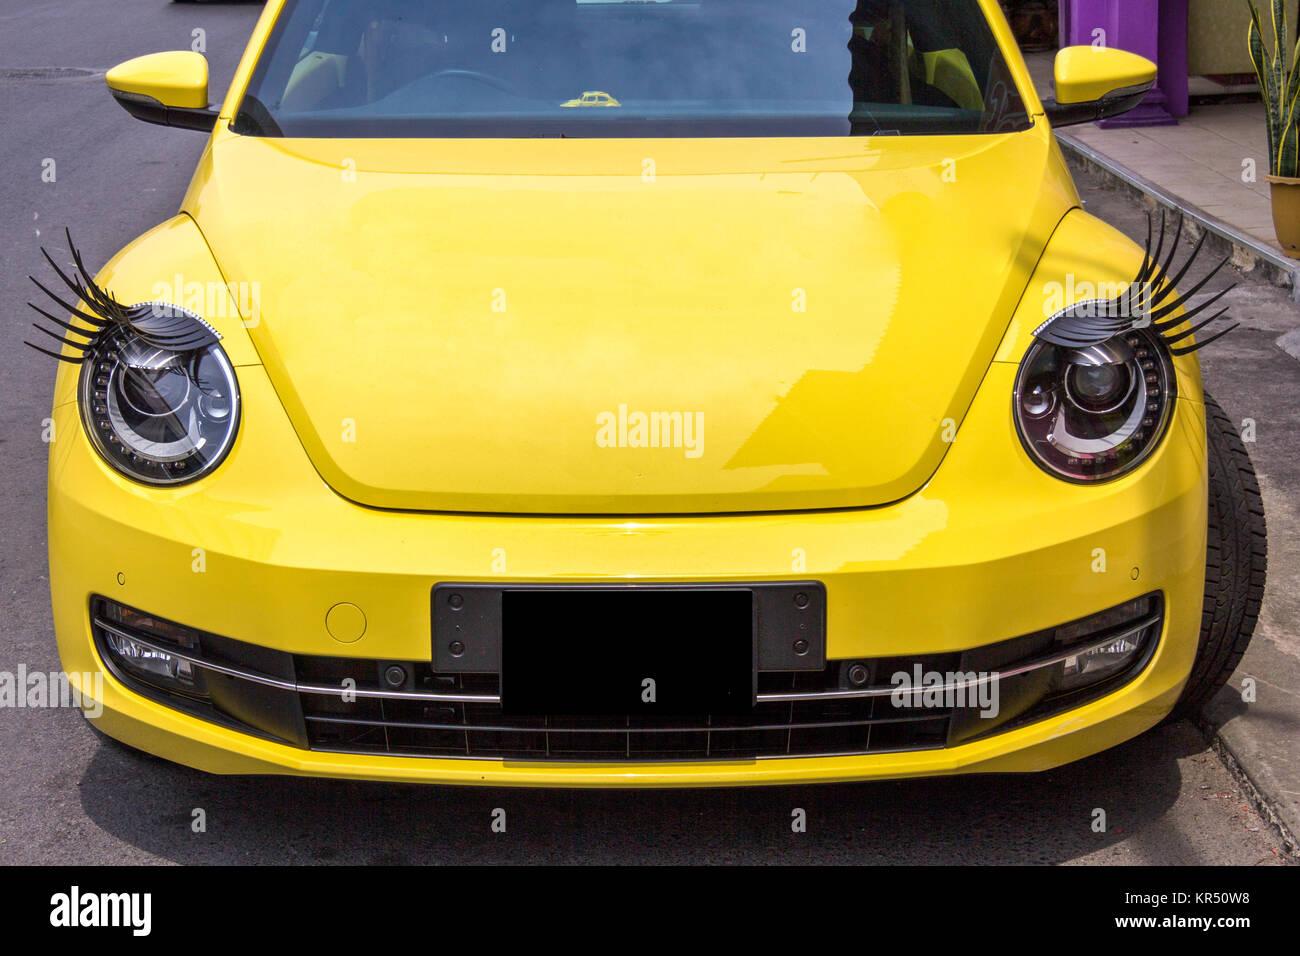 Headlight Beetle Stock Photos & Headlight Beetle Stock Images - Alamy